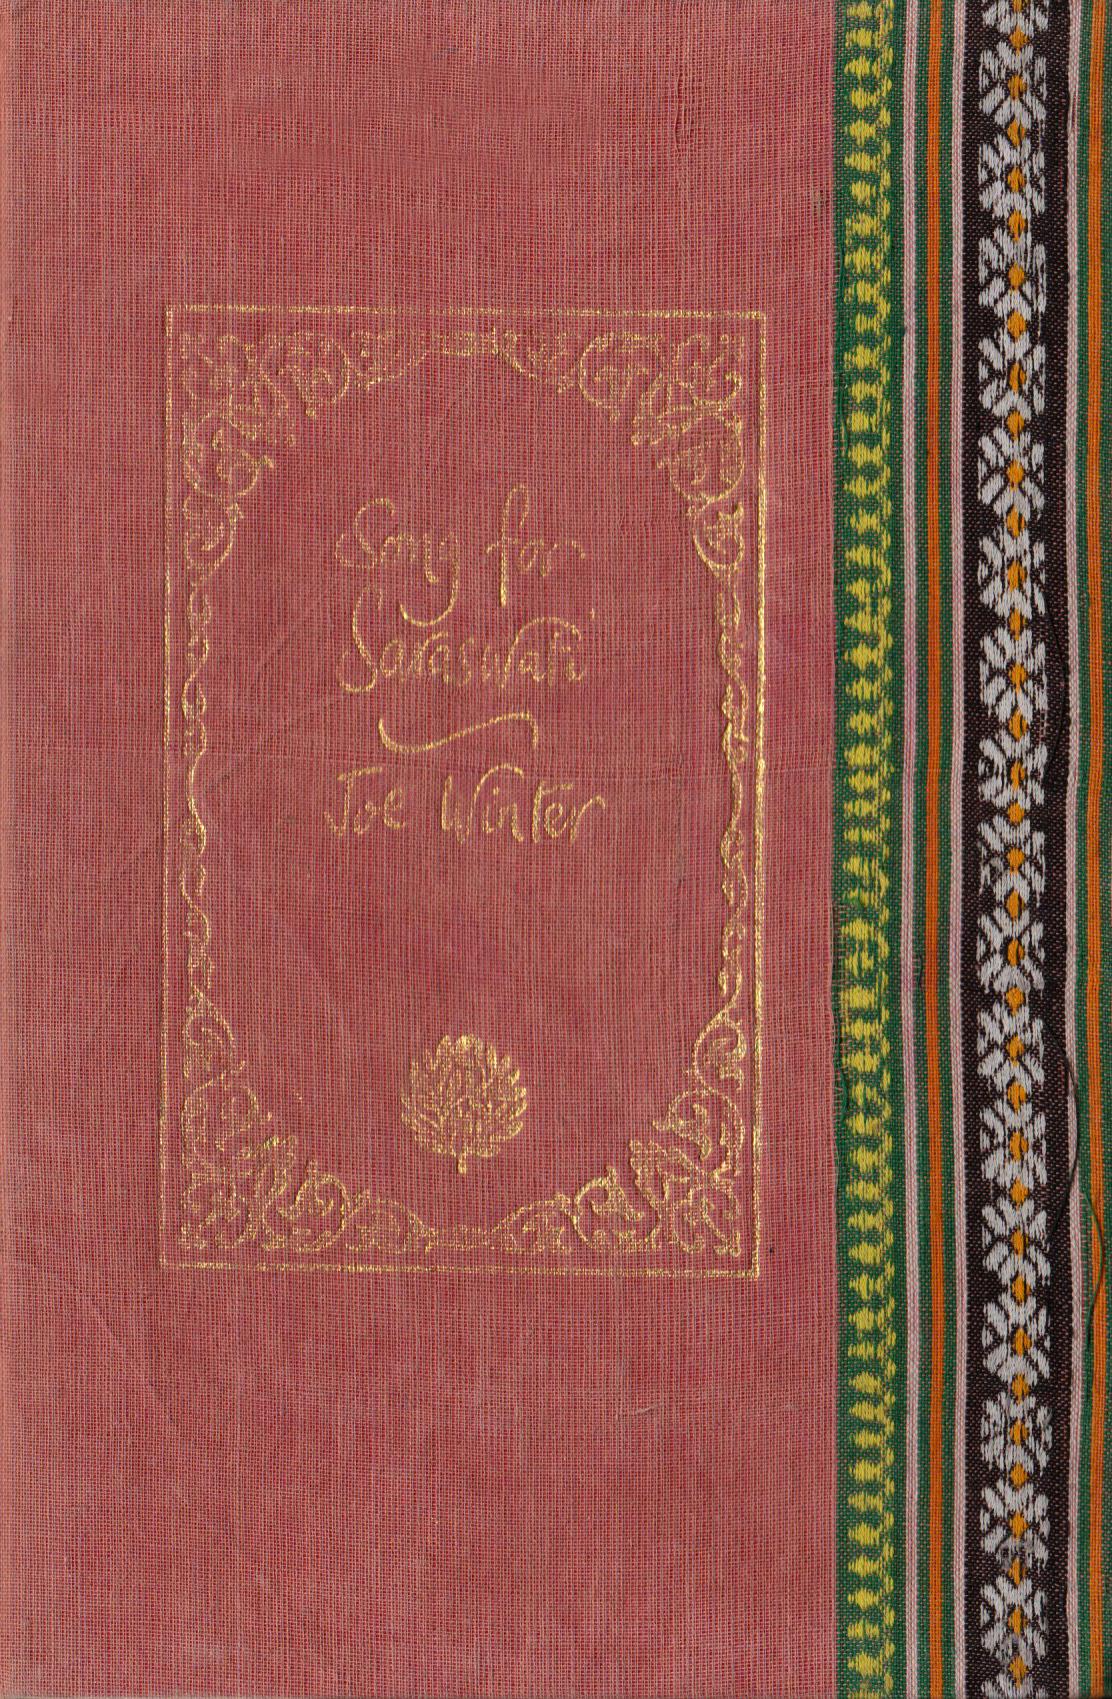 Joe Winter Poetry, Songs for Saraswati